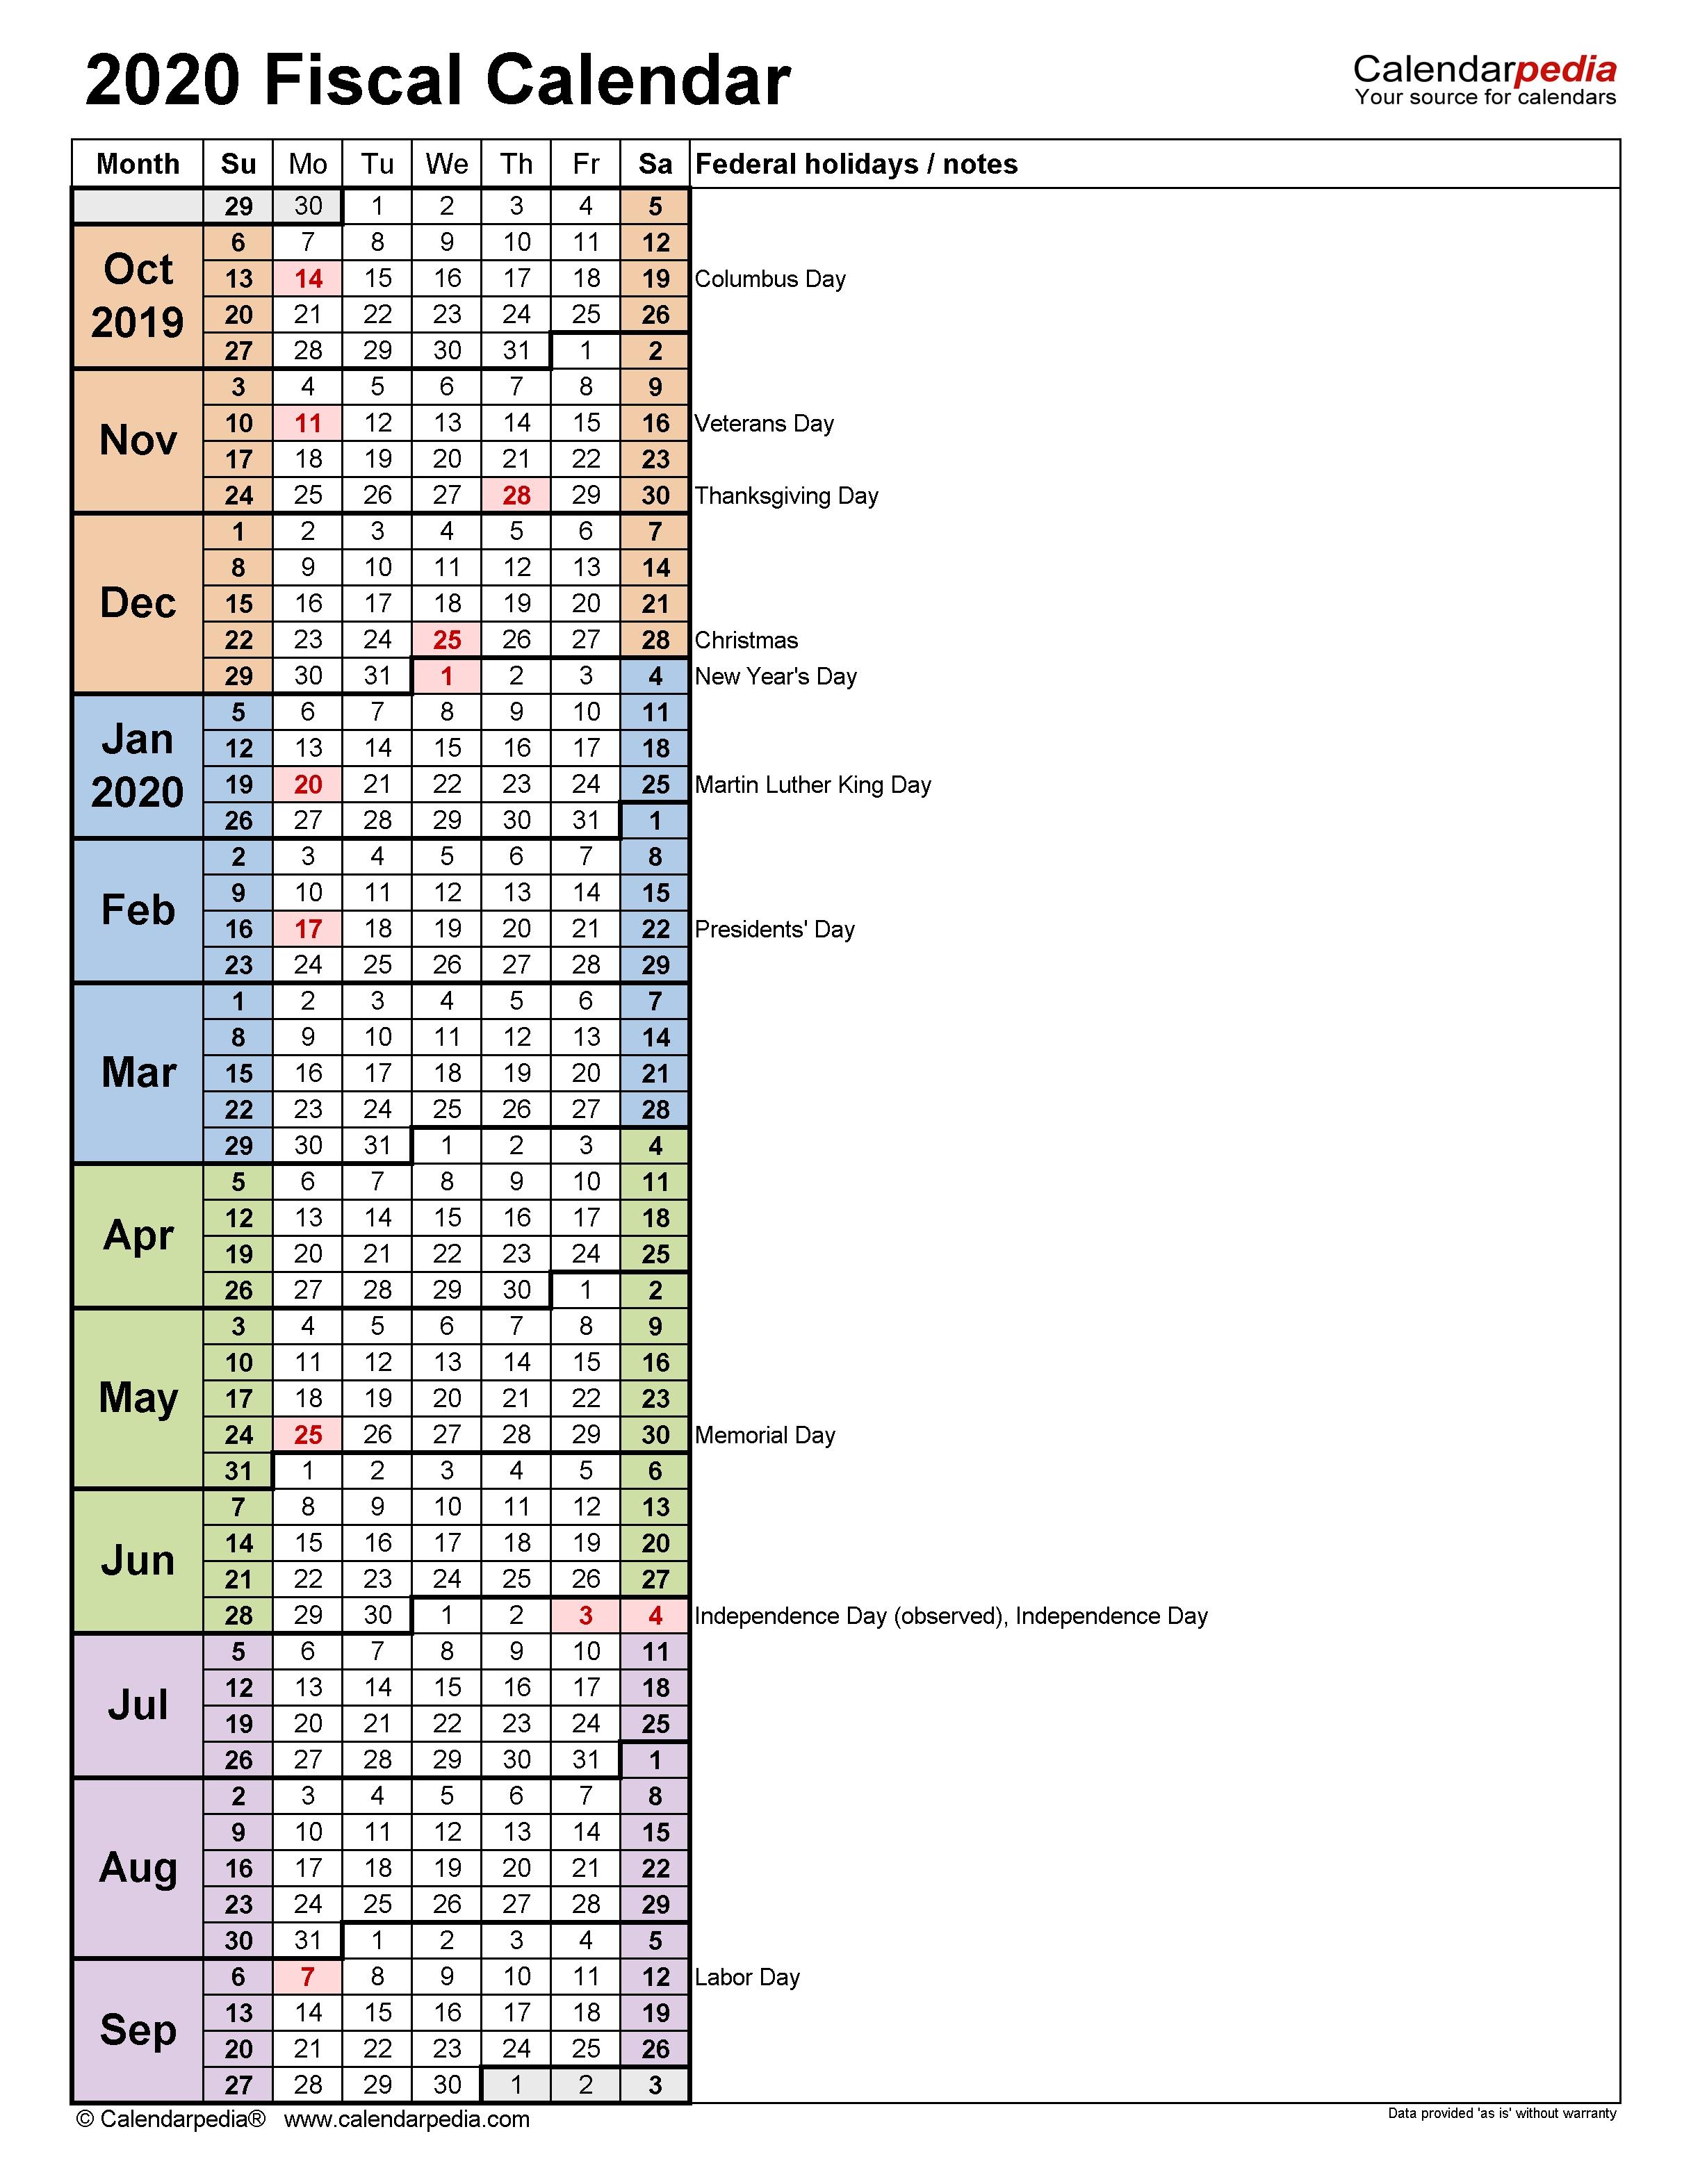 Fiscal Calendars 2020 - Free Printable Pdf Templates with regard to 2020 Fiscal Calendar 4 4 5